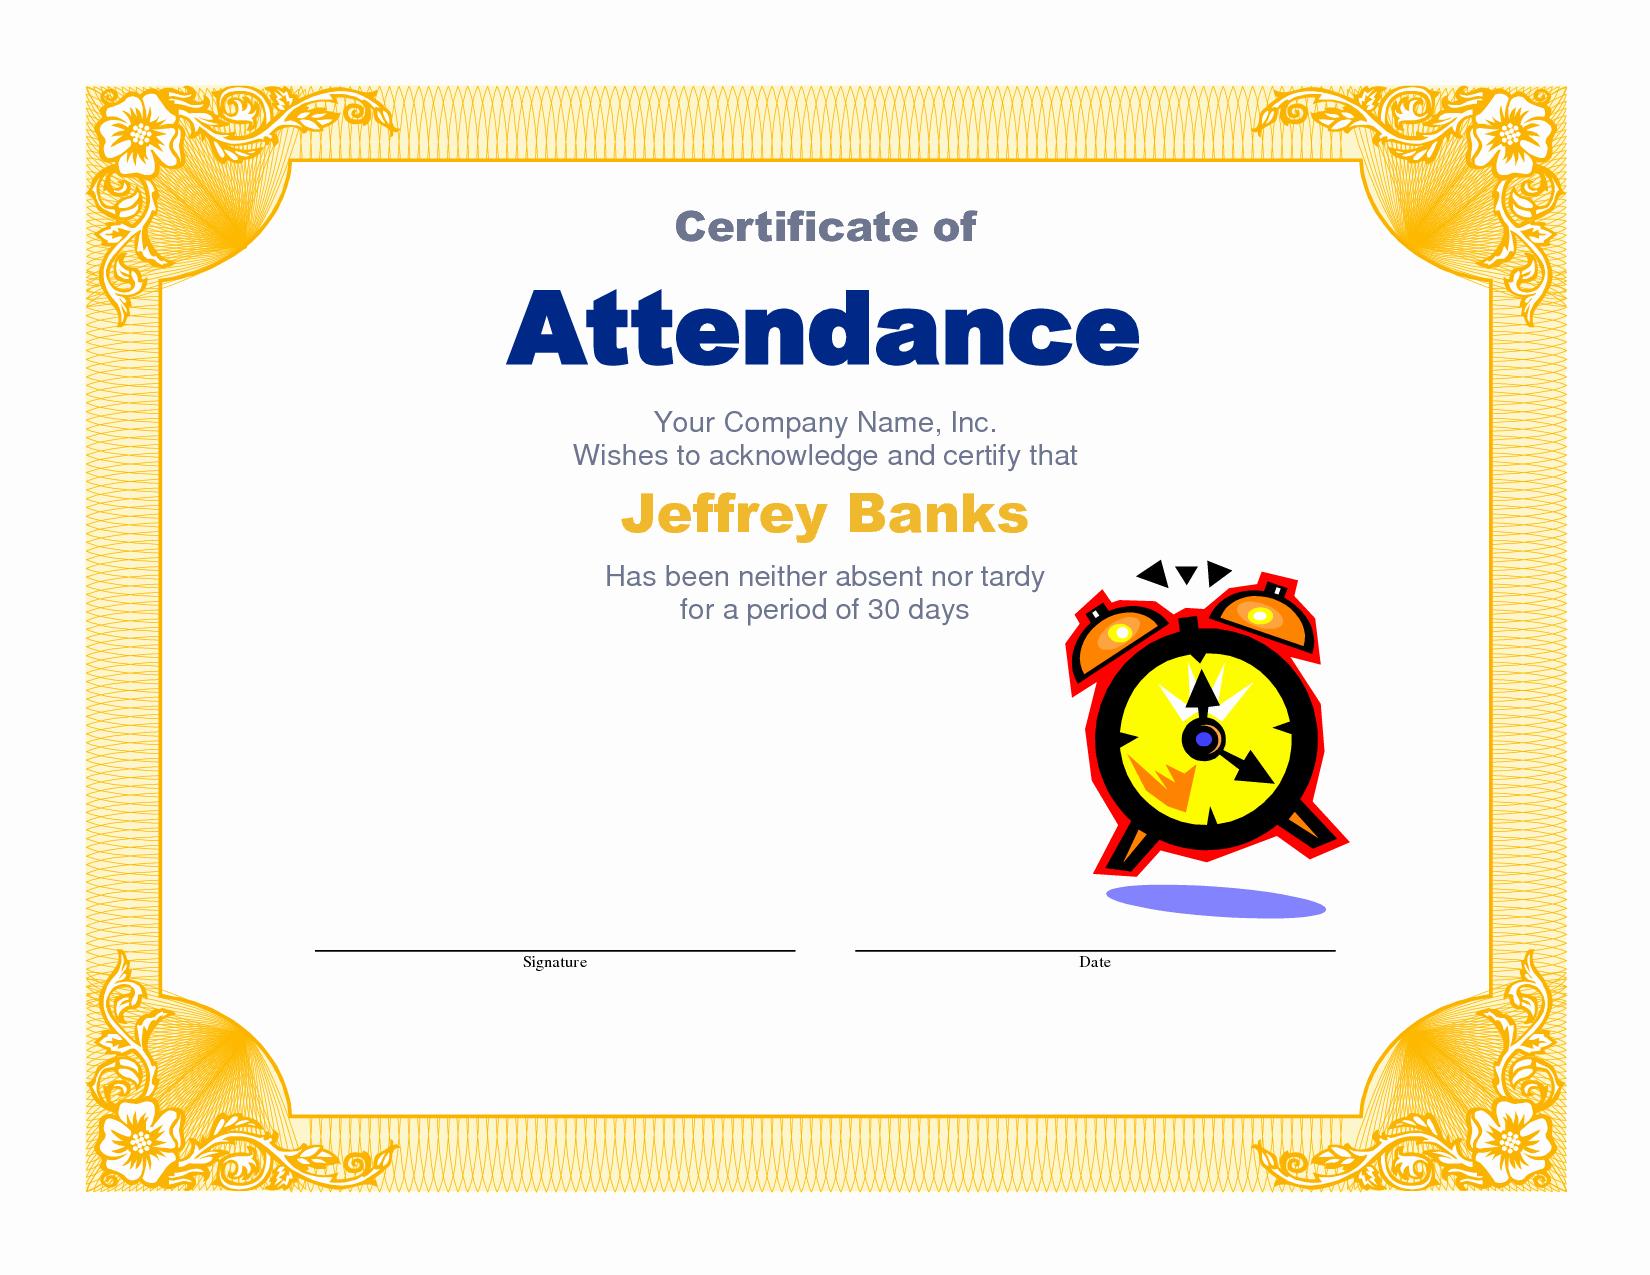 Attendance Certificate format for Employees Best Of Gidiyedformapolitica Urlscan